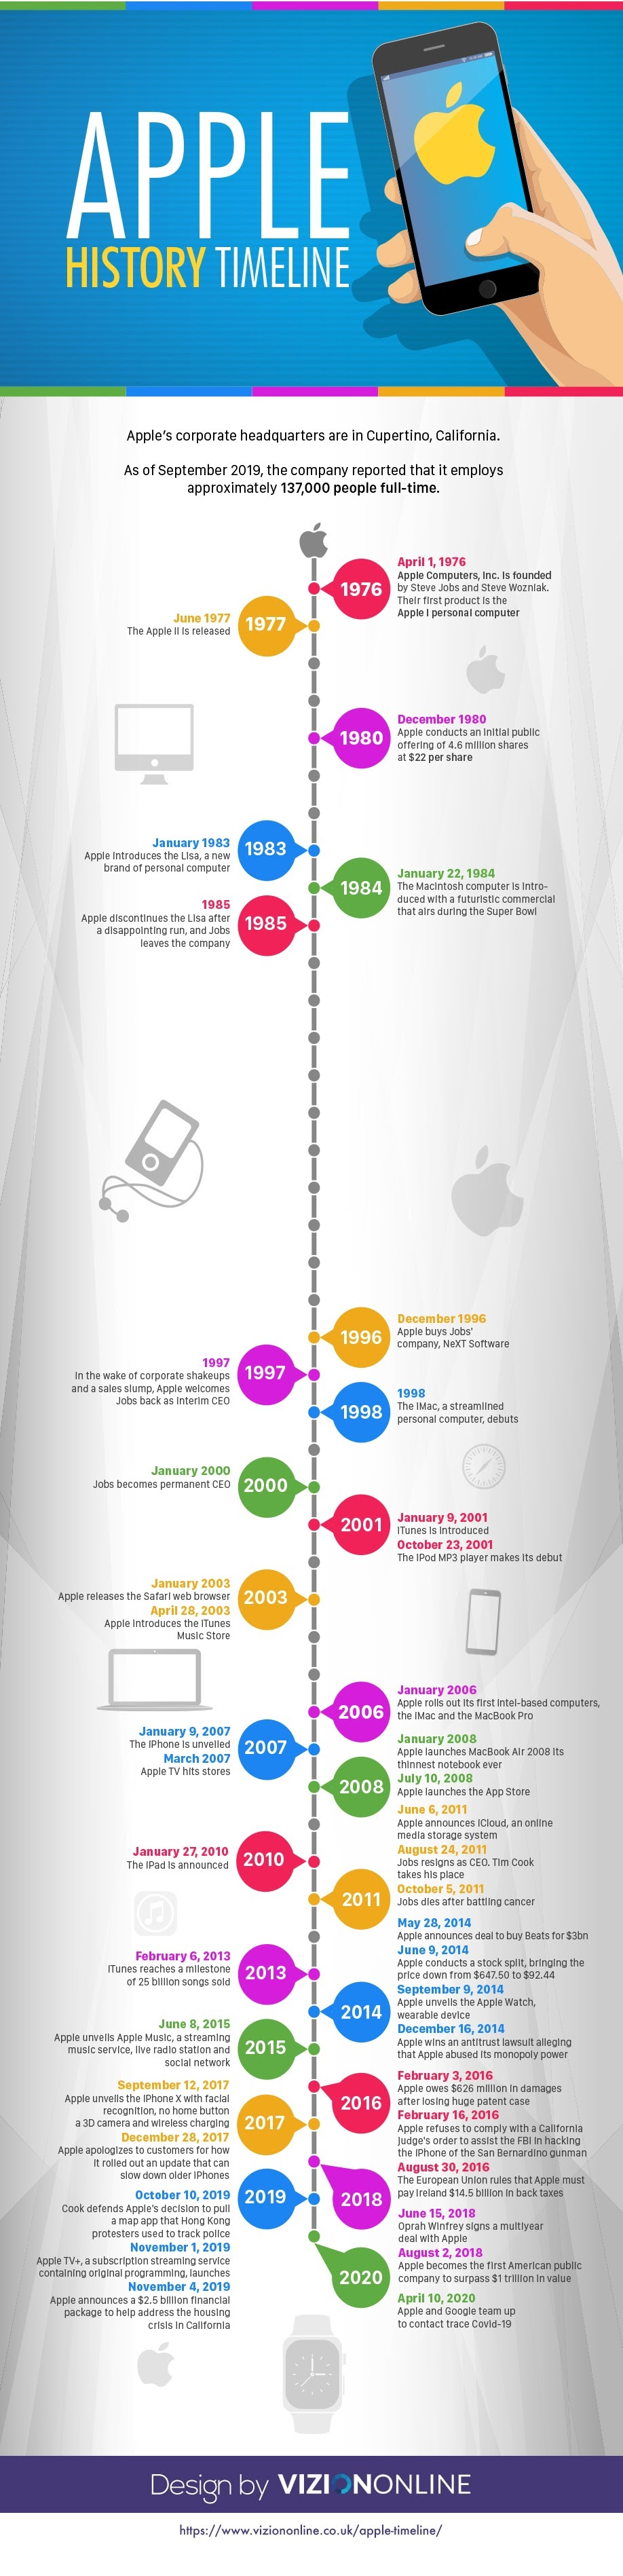 Timeline of Apple